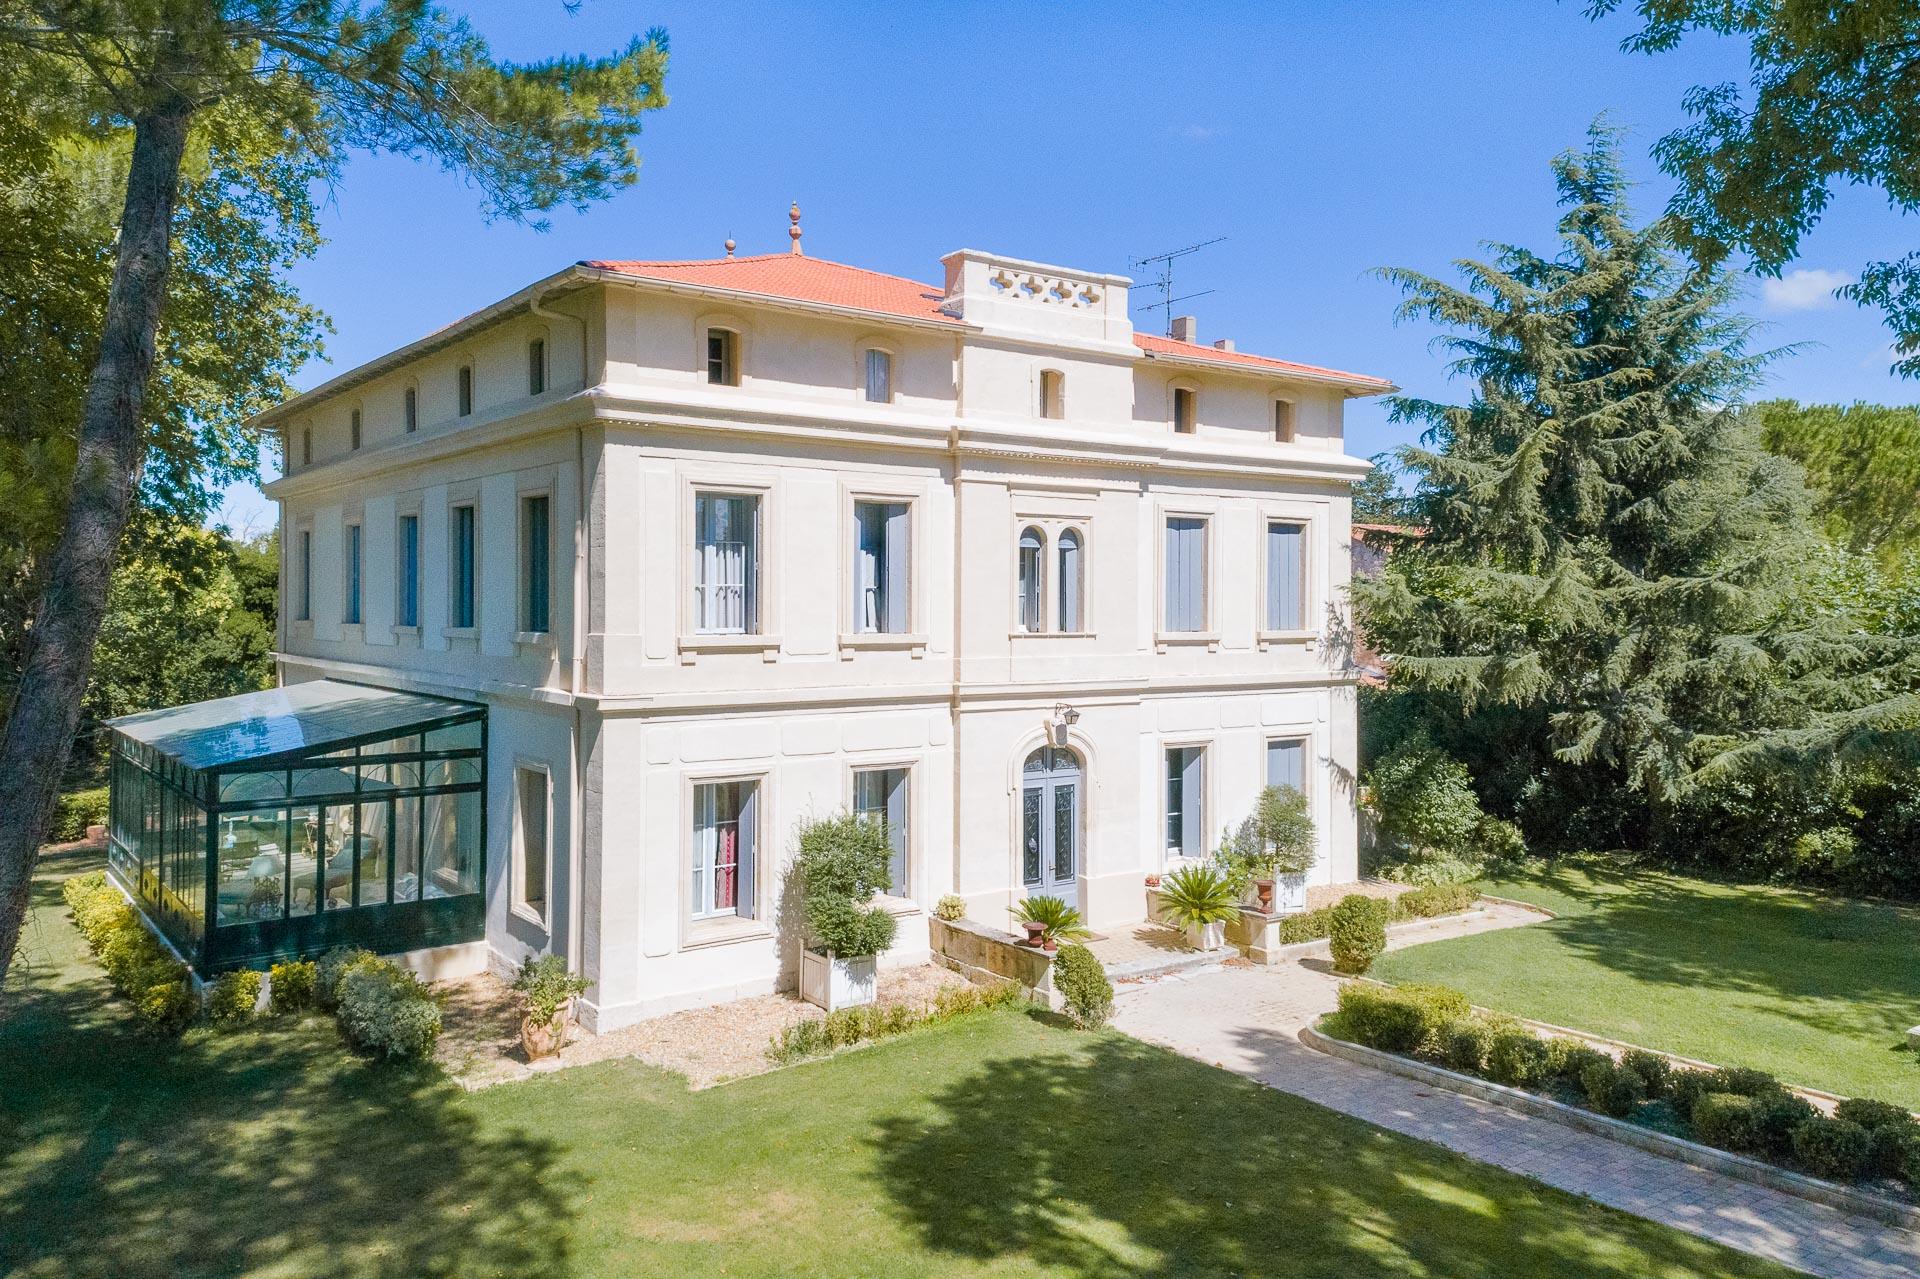 Chateau Sainte Colombe-6.jpg